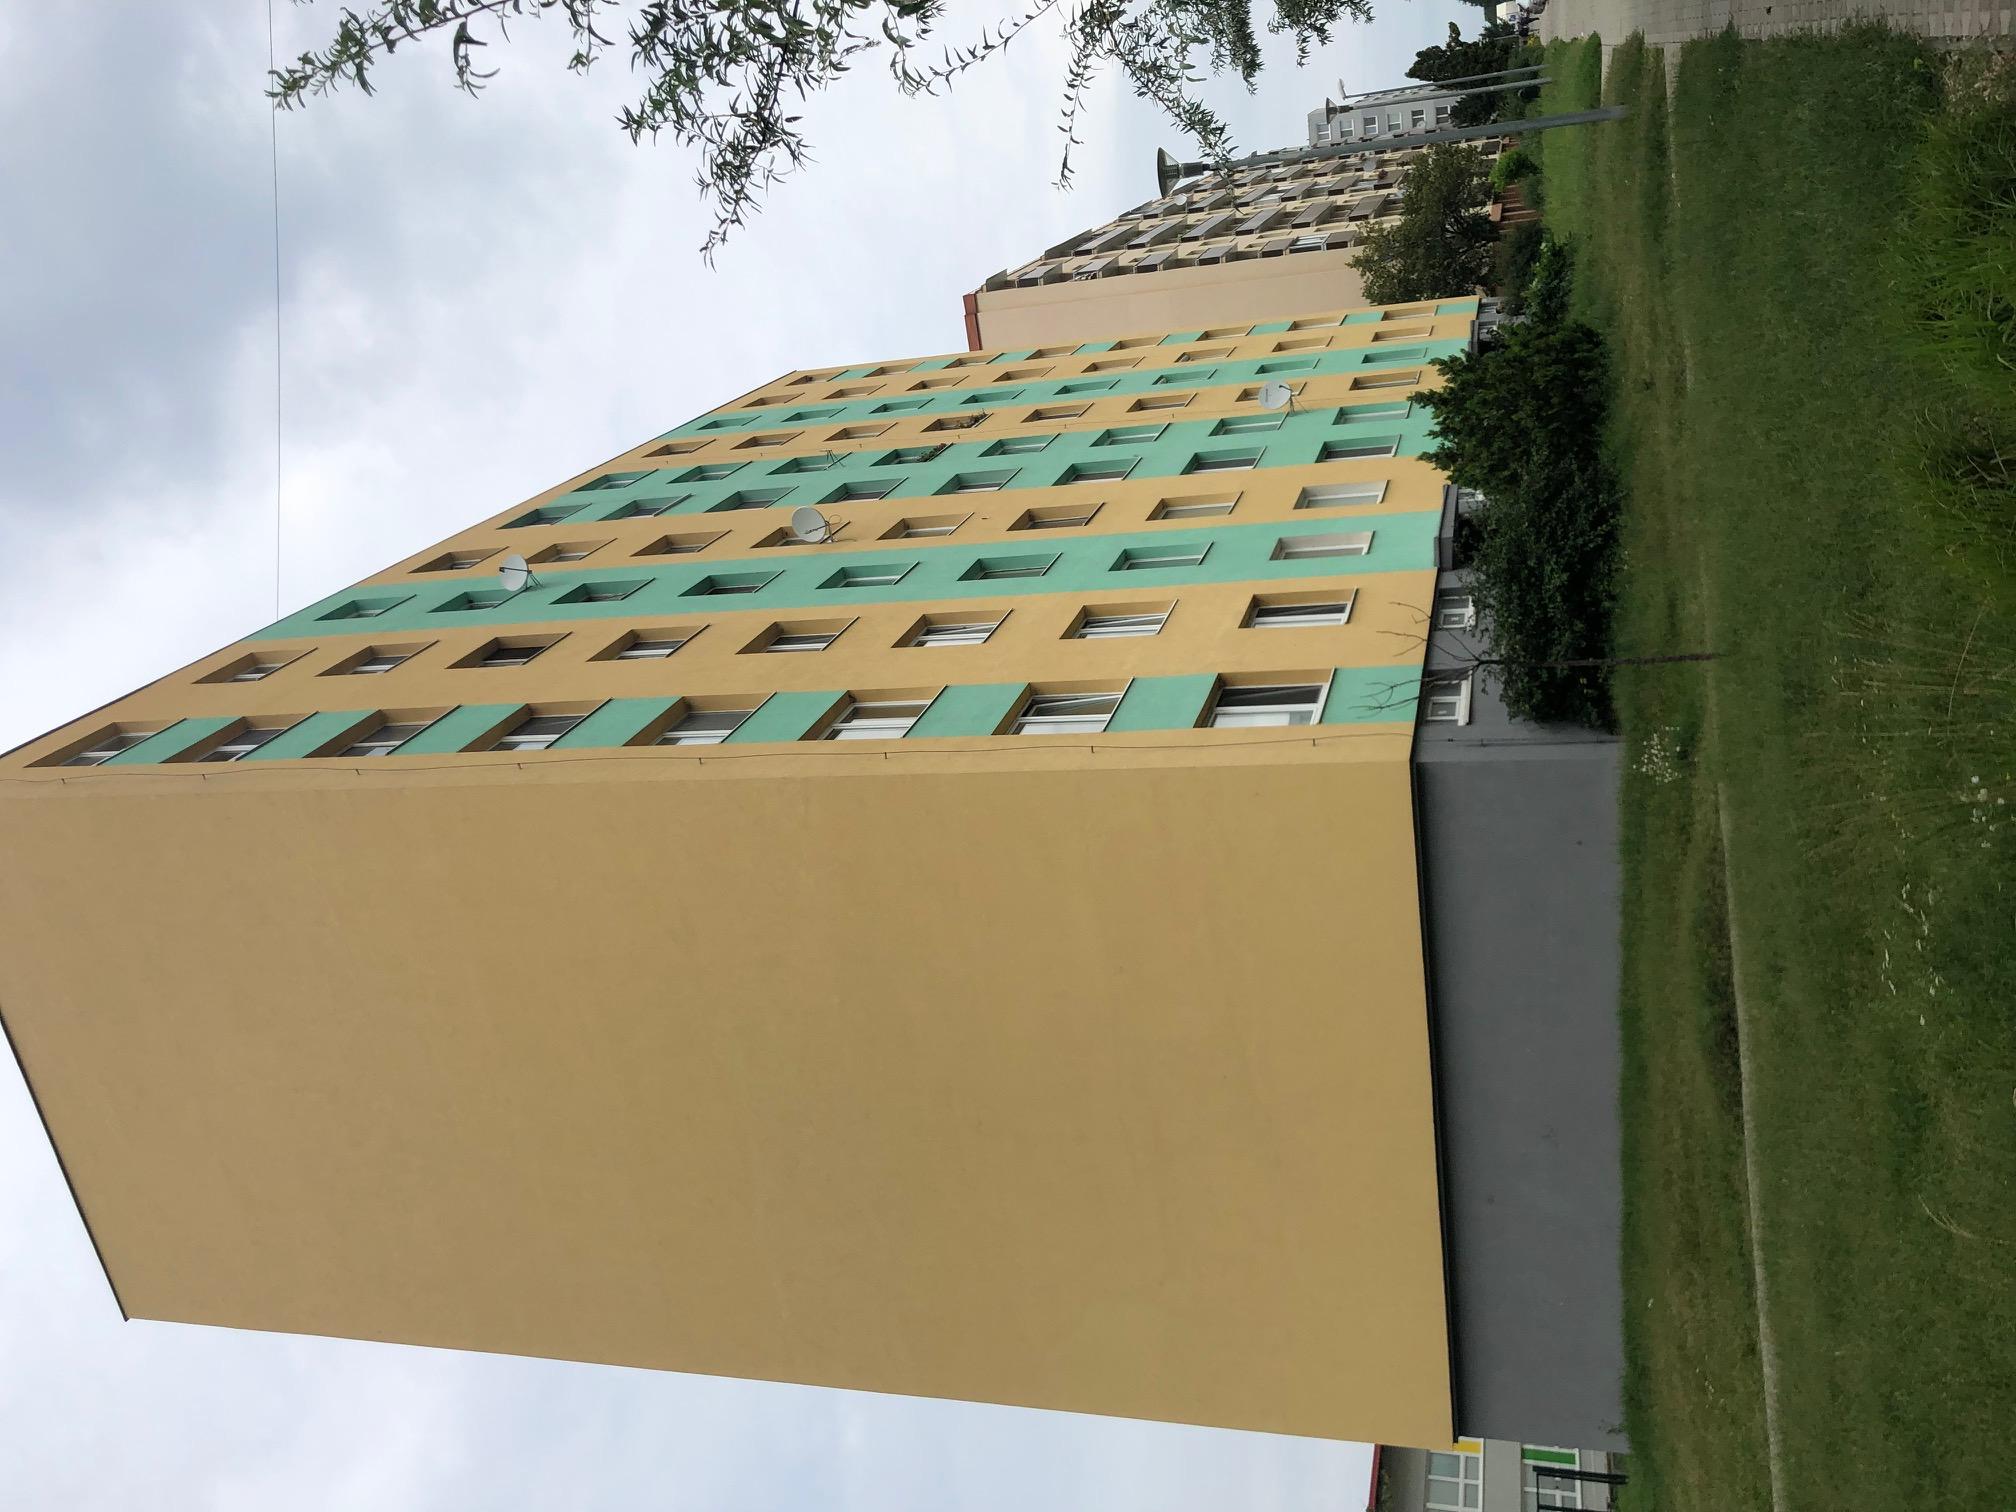 2 izbový byt, 52m2, pivnica, pôvodný stav, Skuteckého, Malacky Juh-30